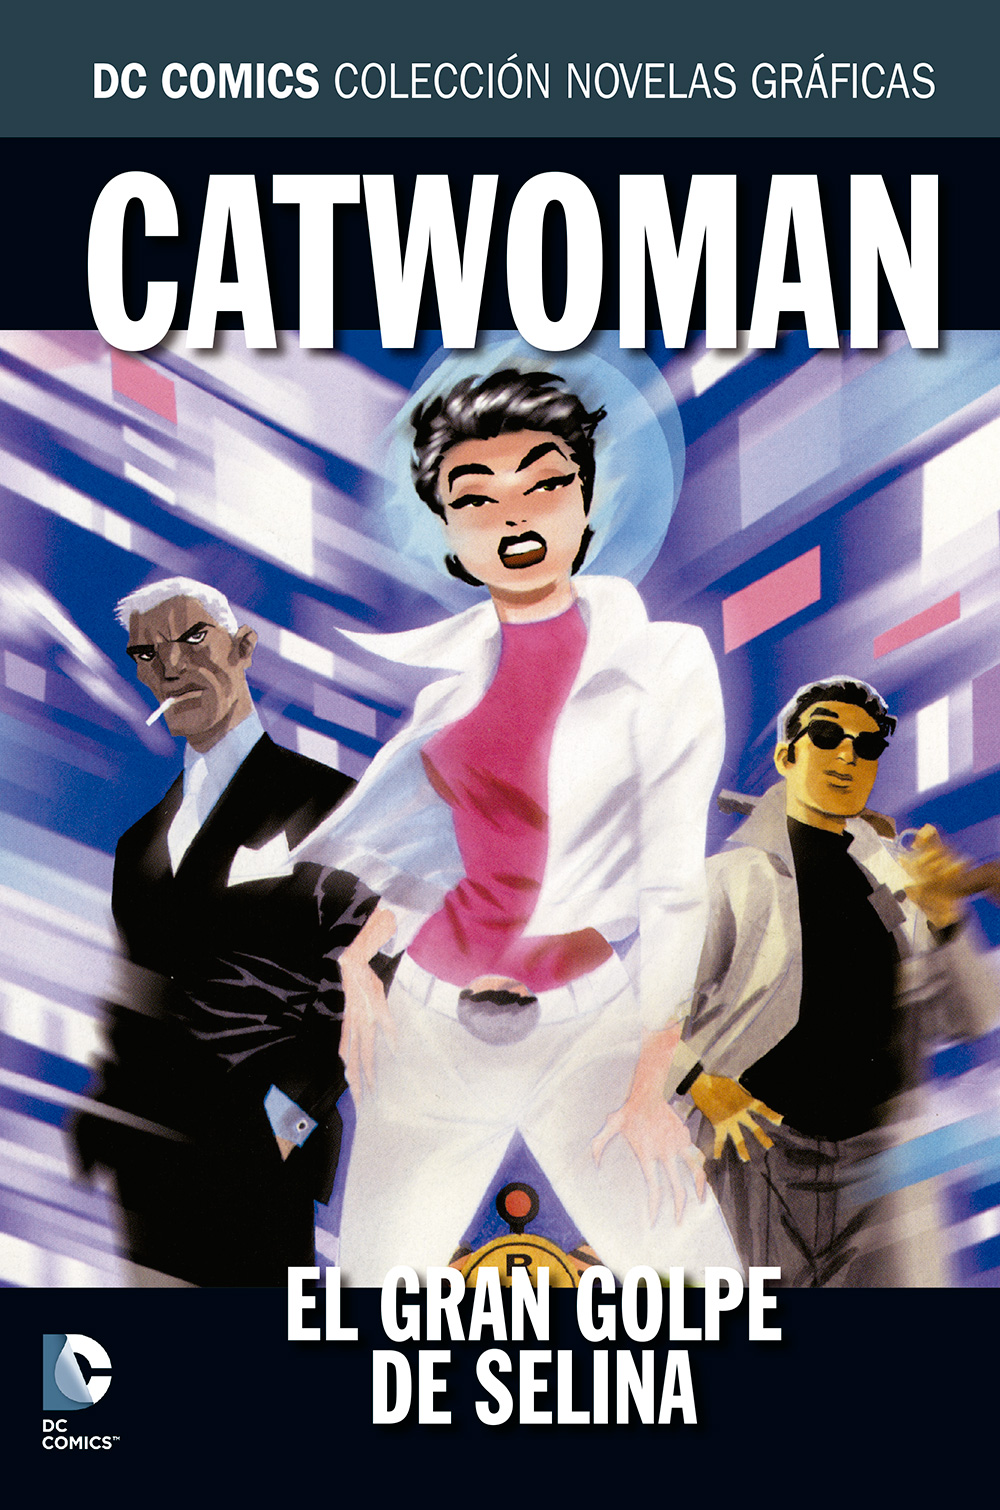 836 - [DC - Salvat] La Colección de Novelas Gráficas de DC Comics  SF118_032_01_001